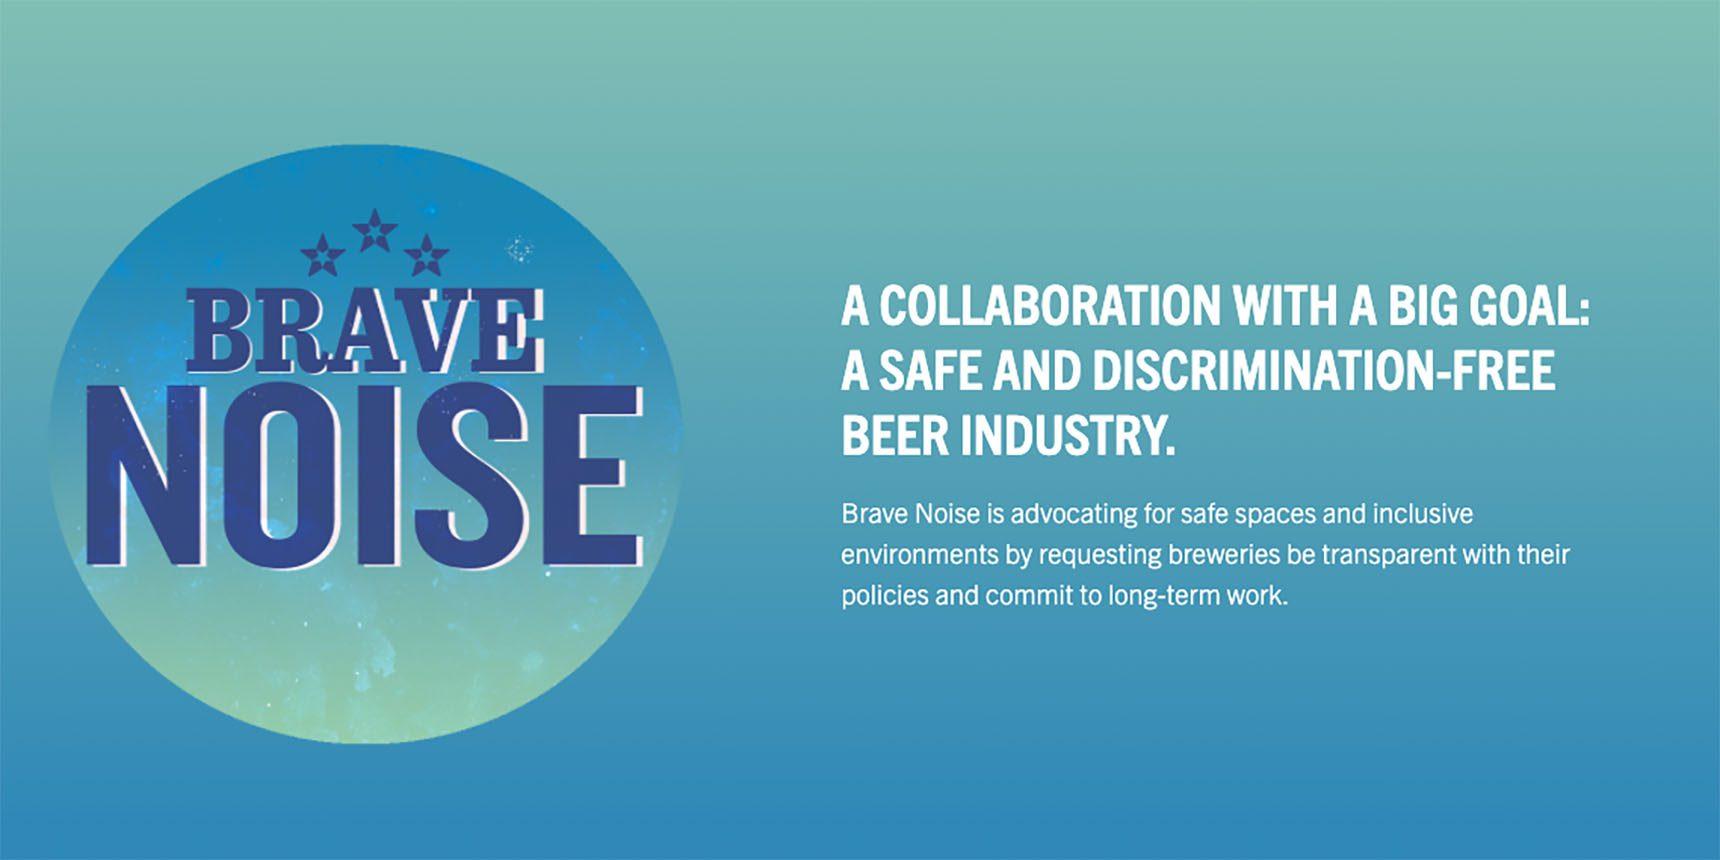 Brave Noise Beer